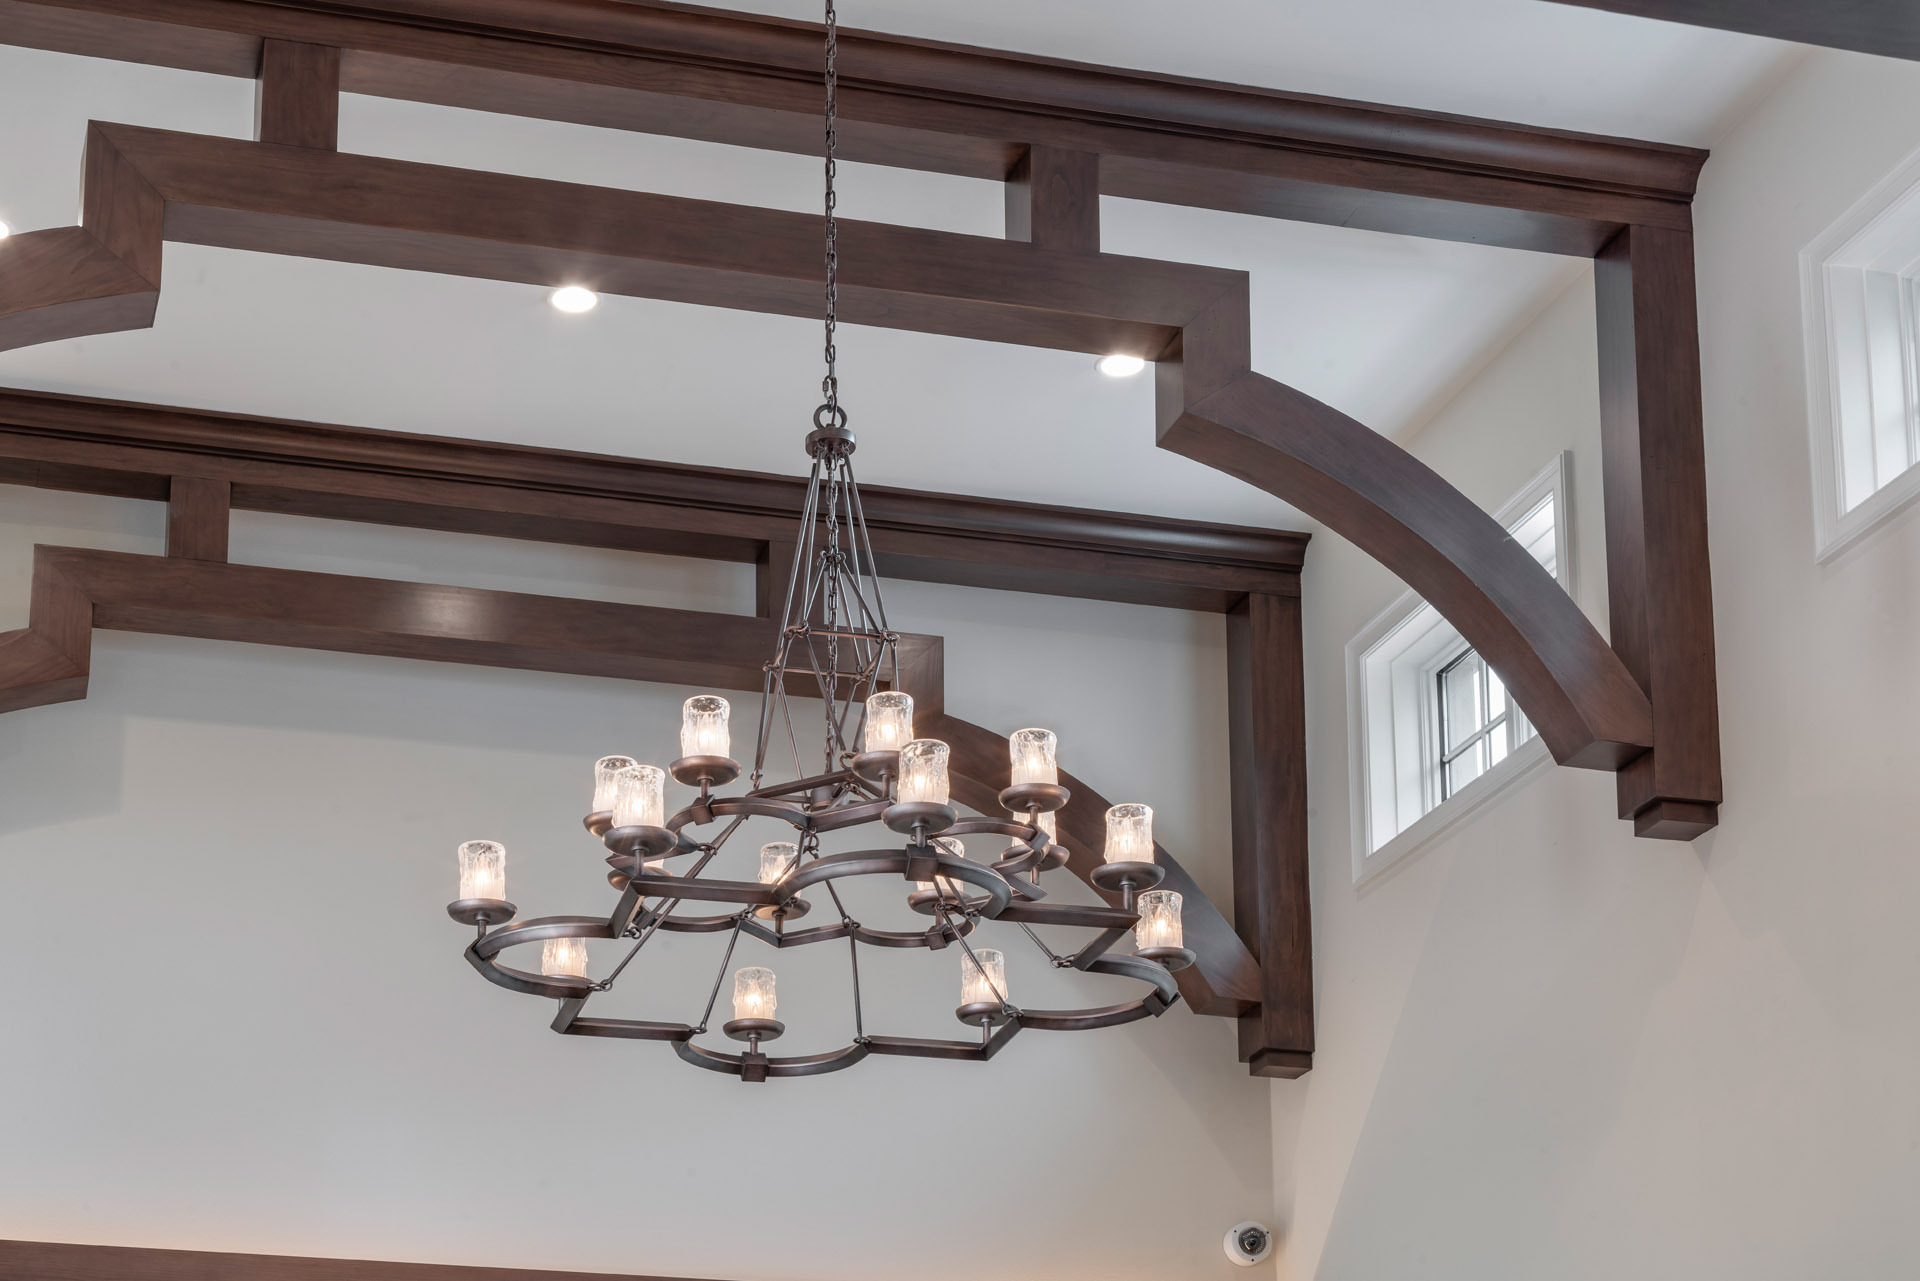 elegant wooden ceiling beams and chandelier by Einheit custom homes